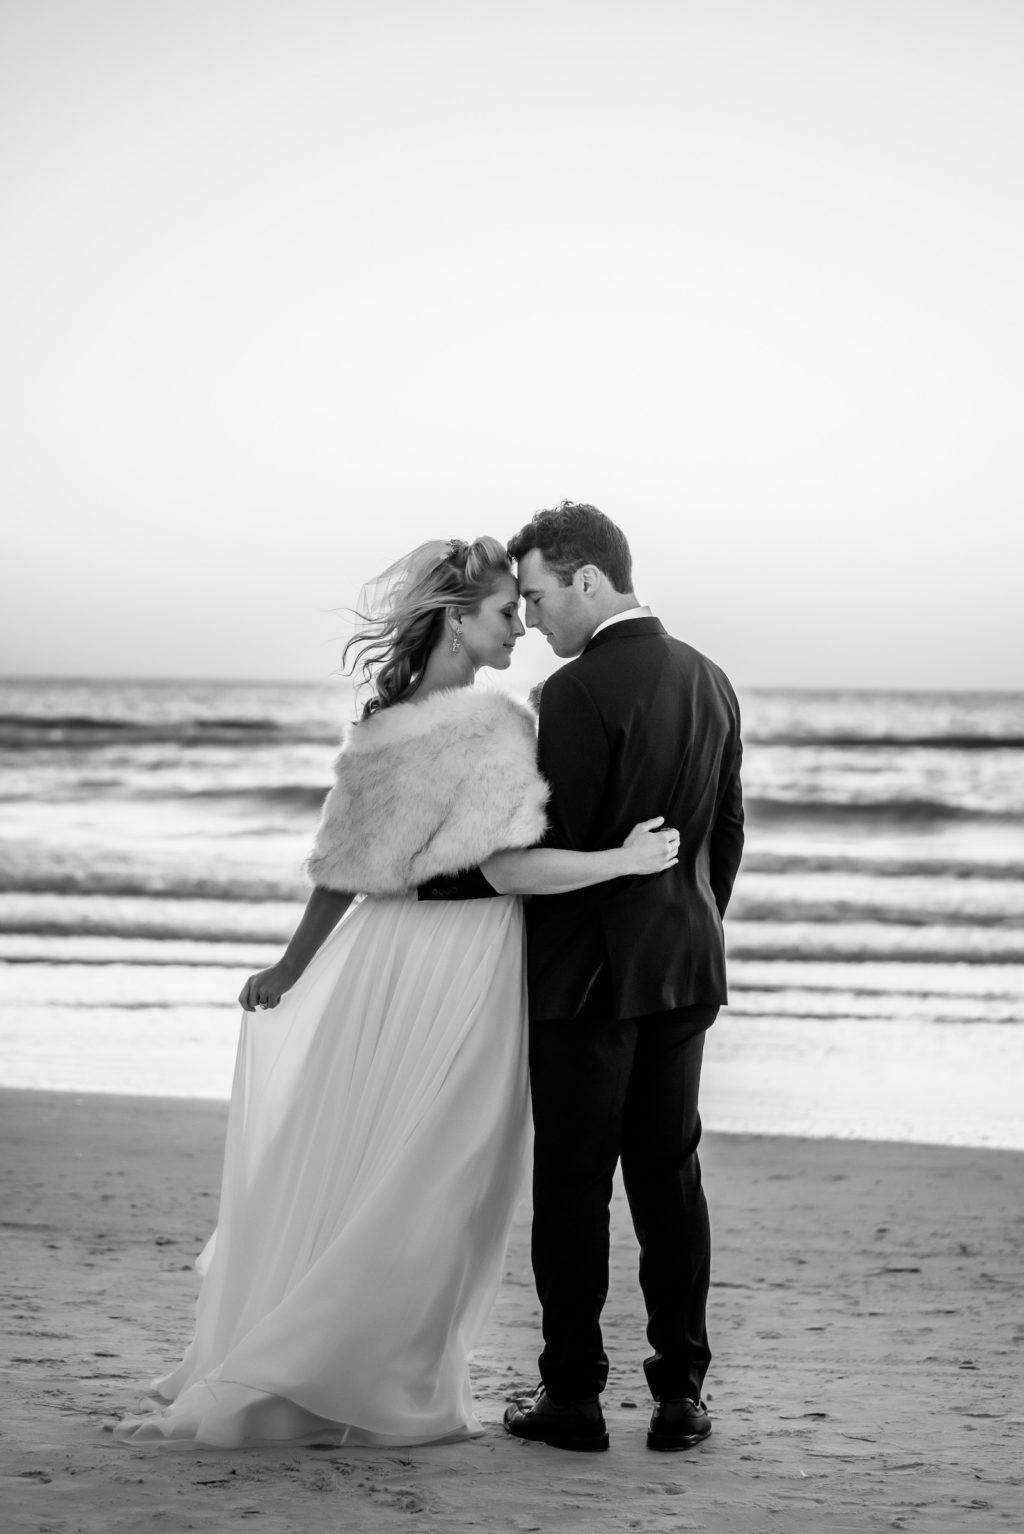 Black and White Groom and Bride Wearing White Fur Shawl on Beach | Tampa Bay Wedding Dress Isabel O'Neil Bridal | Florida Beach Wedding Portraits